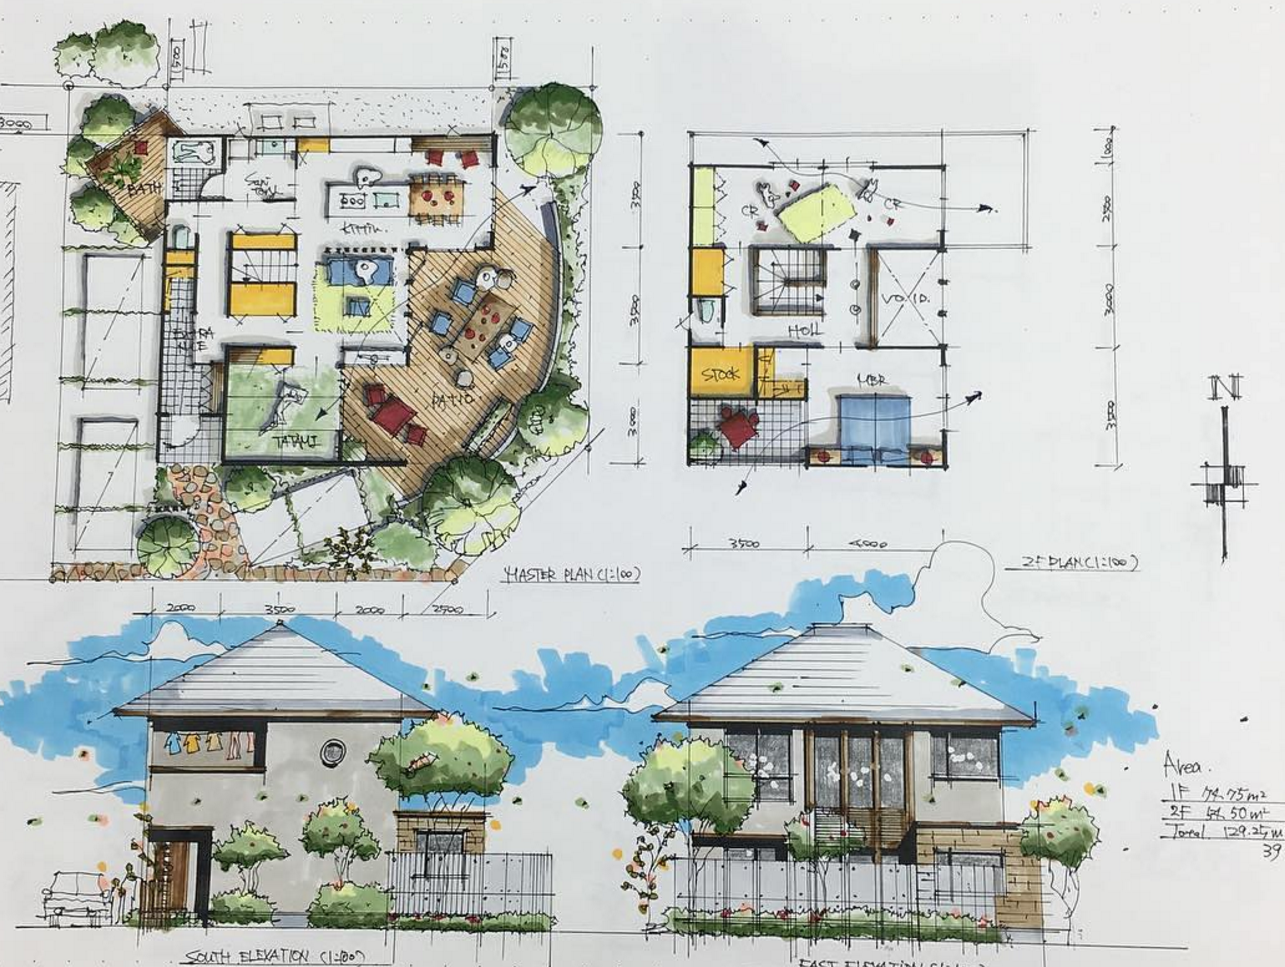 101 planos de casas planos de casas de 2 plantas peque as for Casa vivienda jardin pdf